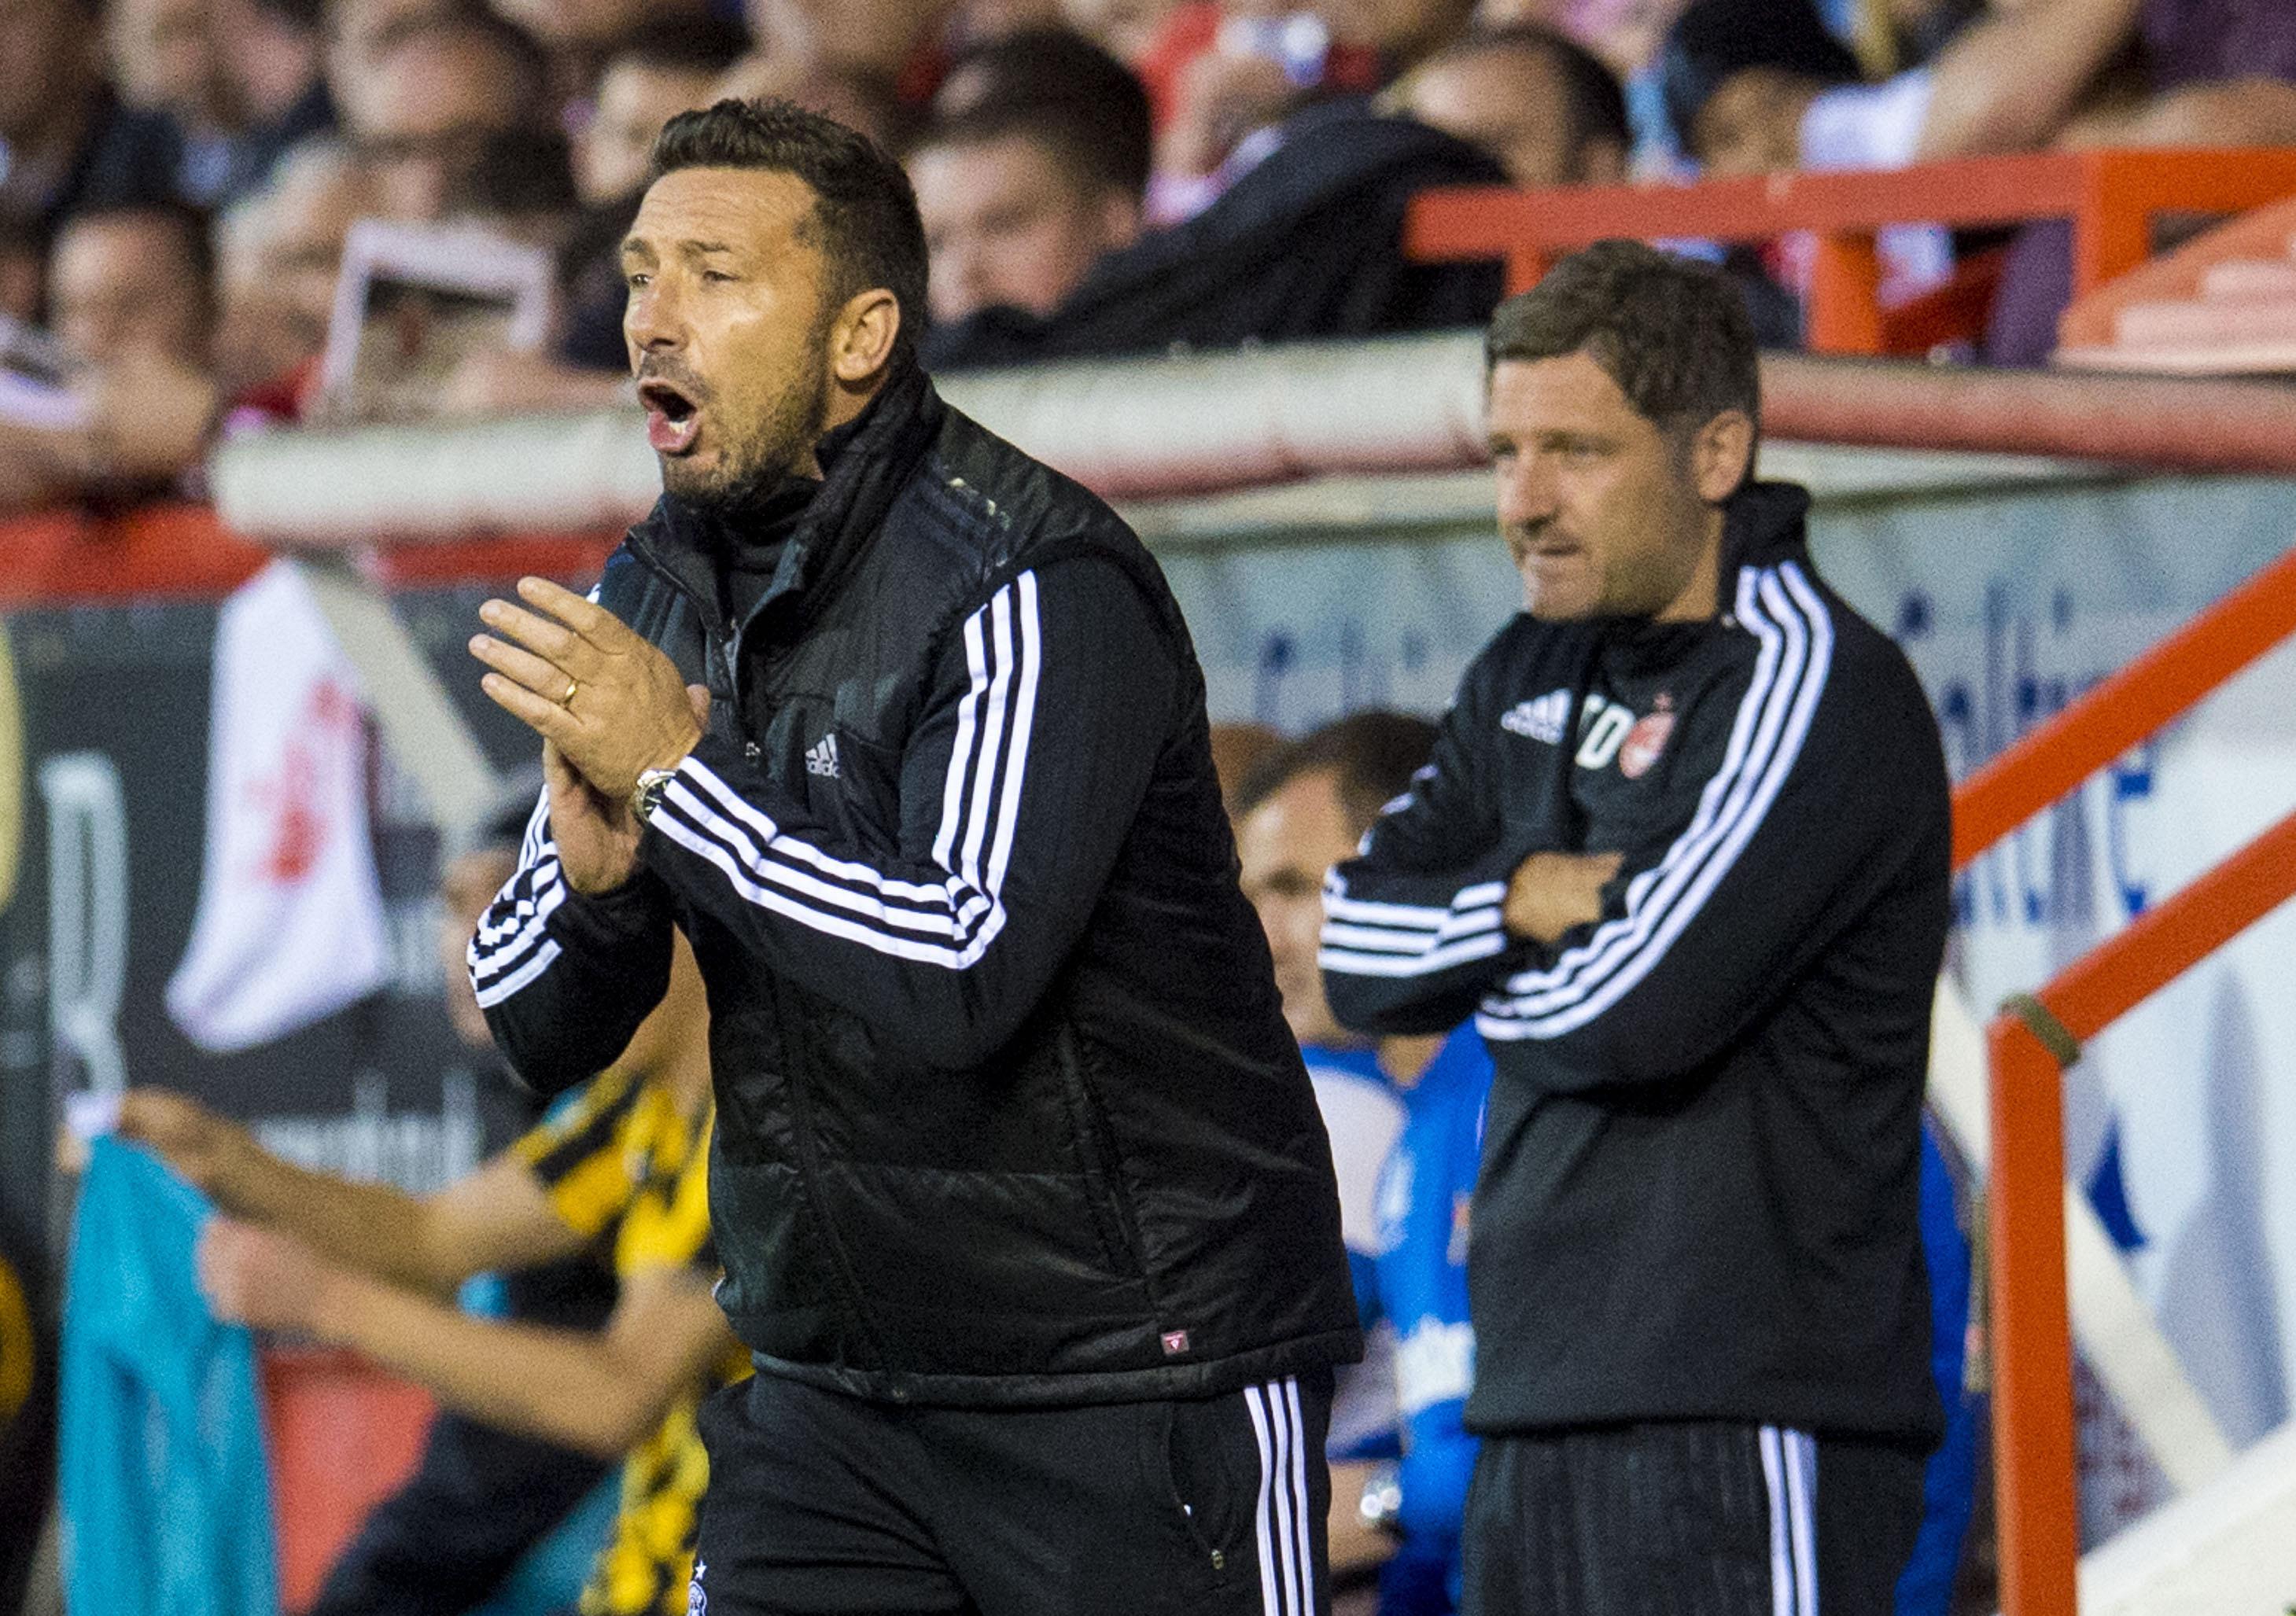 Dons boss Derek McInnes roars on his team at Pittodrie.